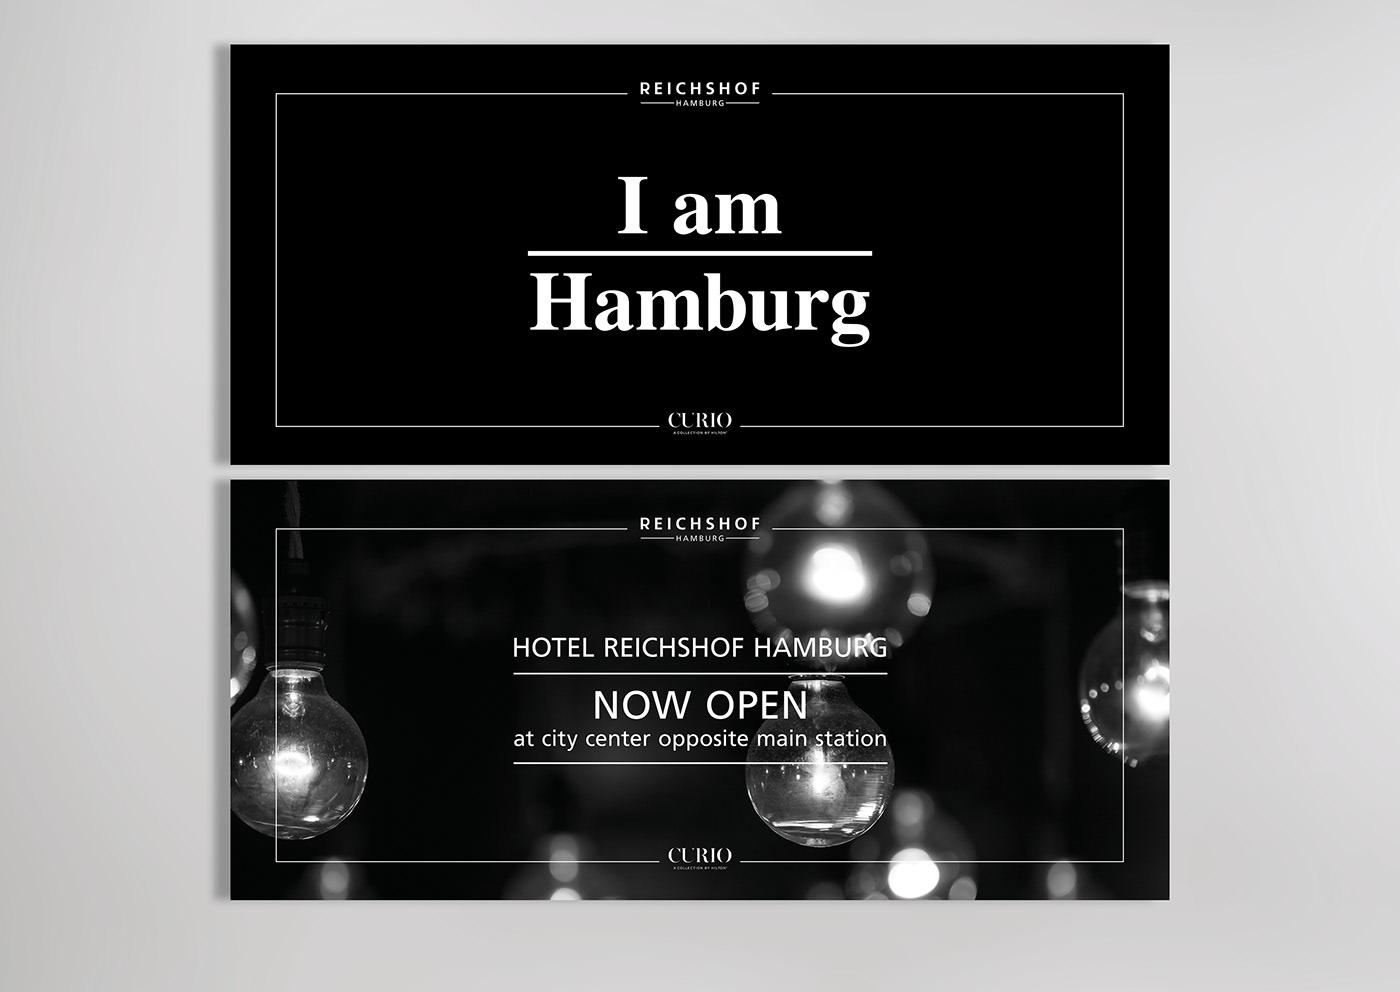 menu advert banner newsletter Drinks Menu Citiylight Promotion